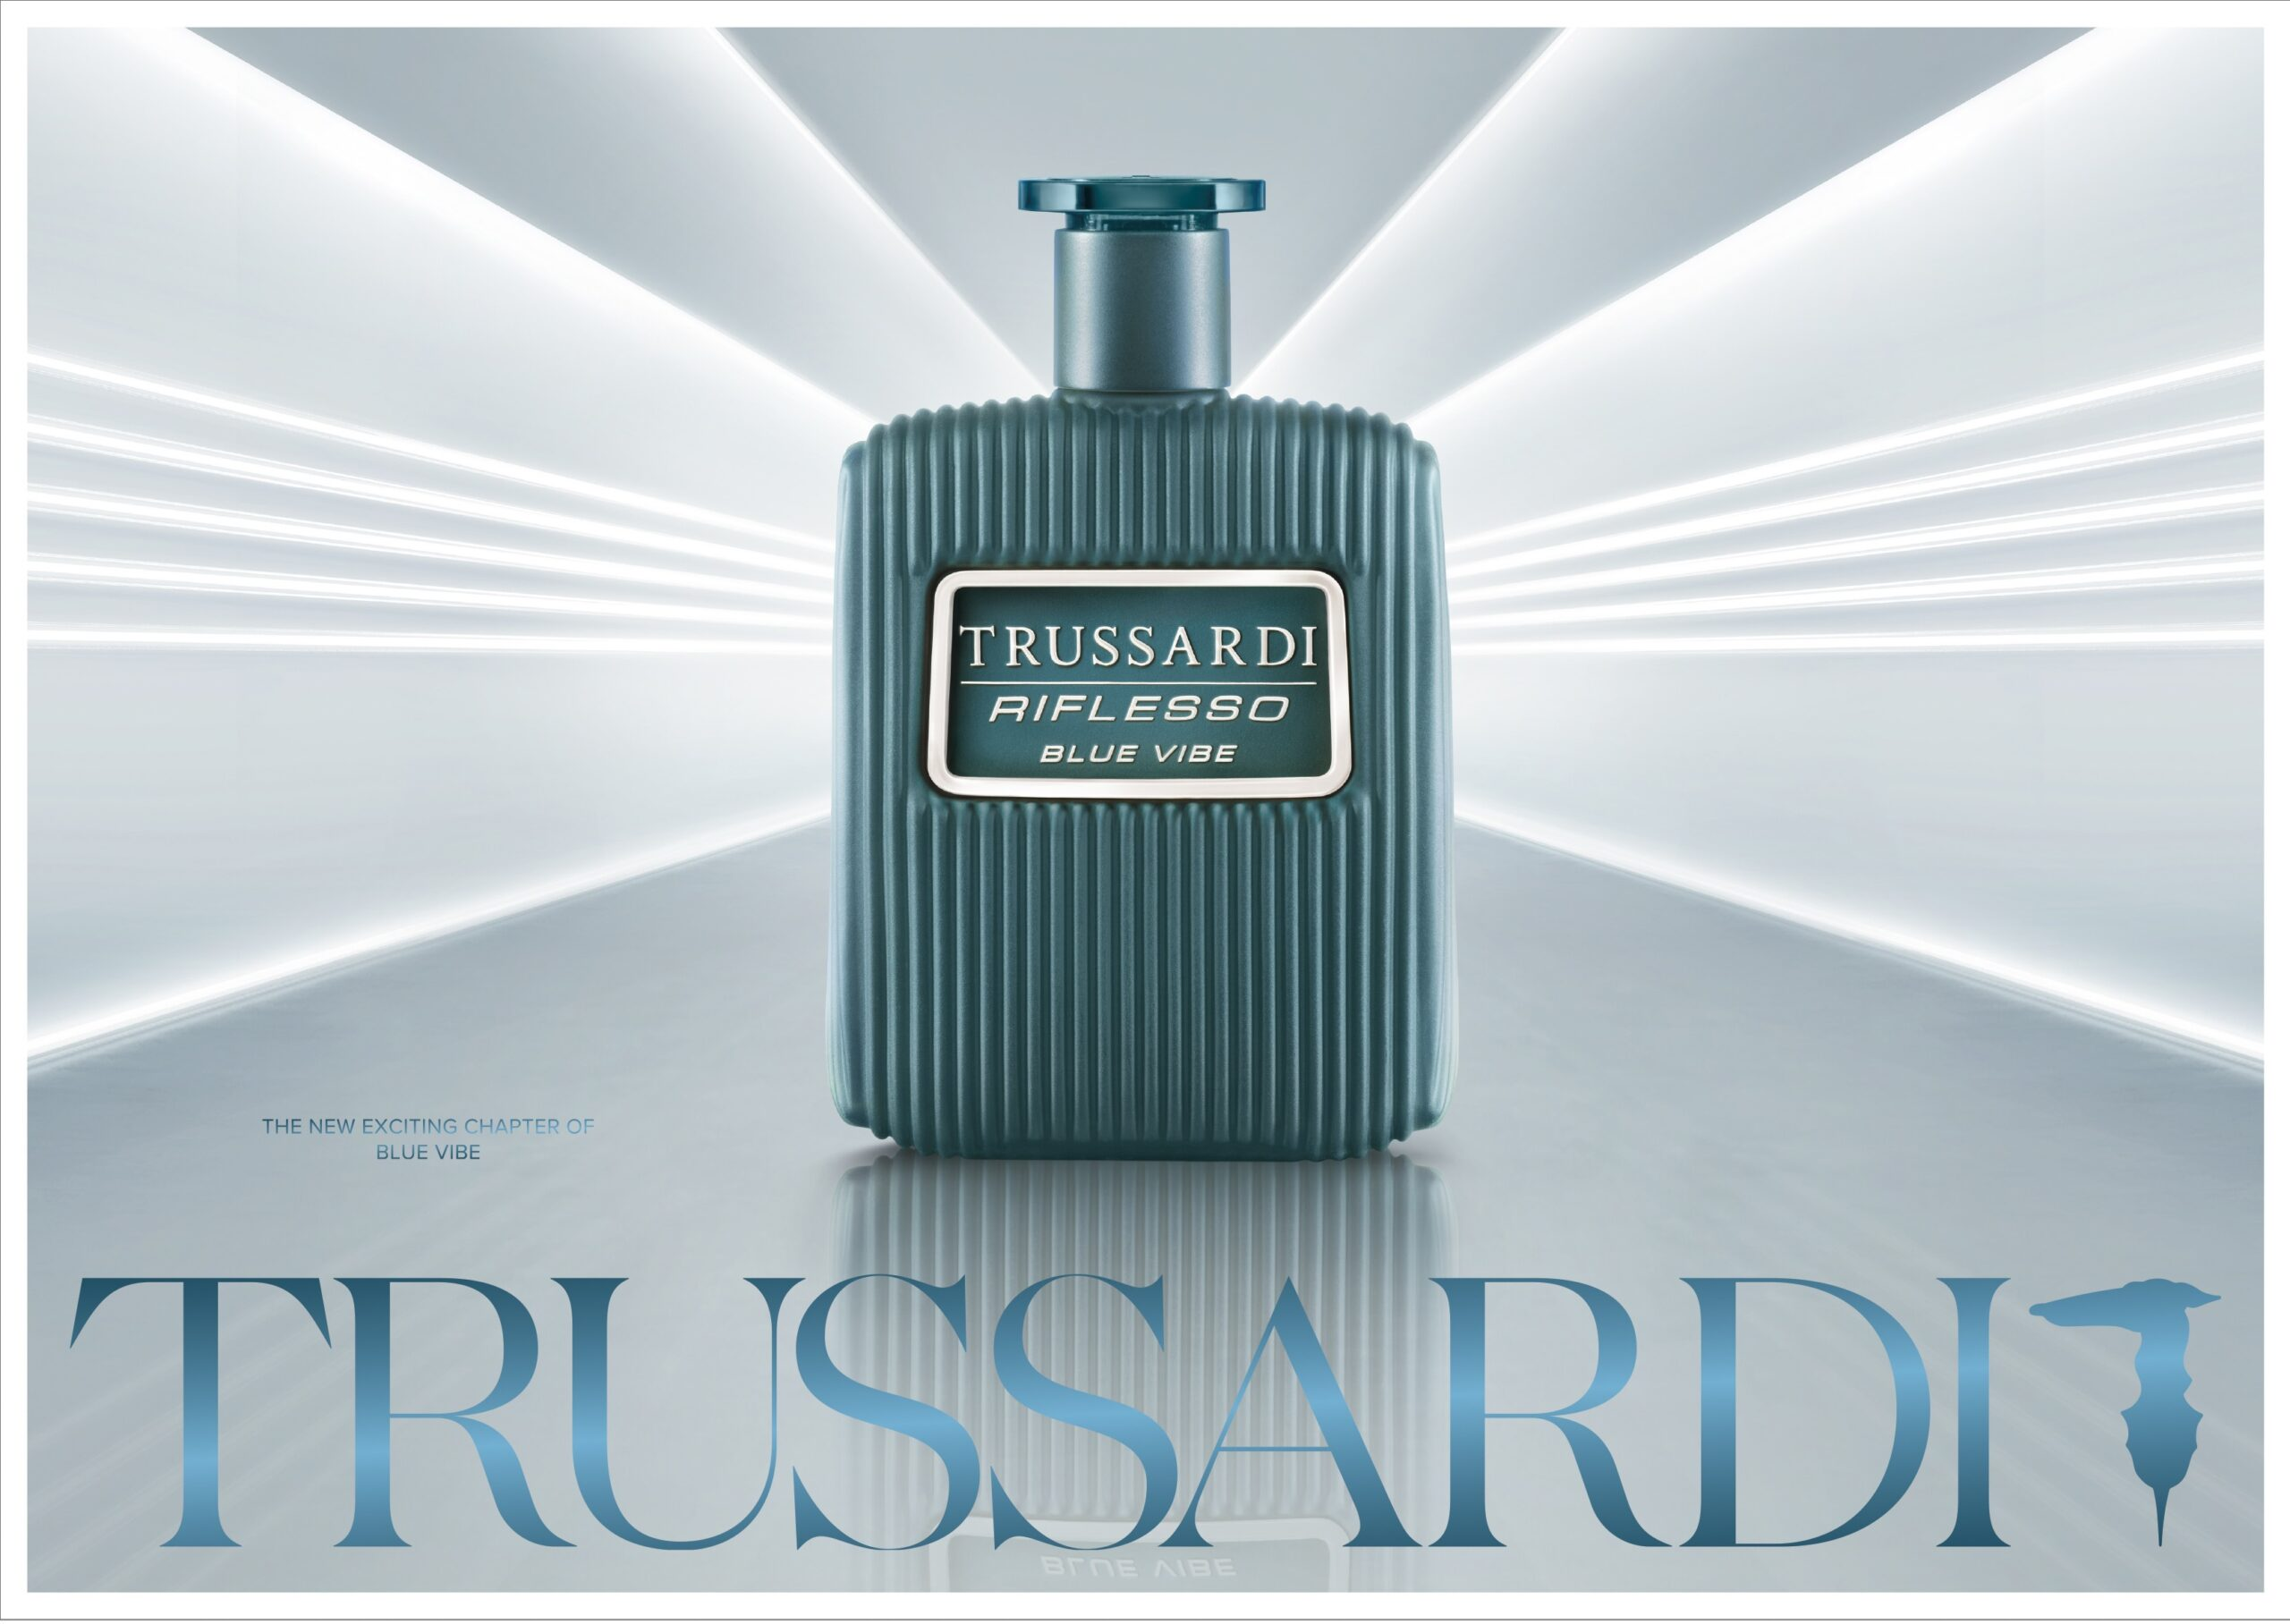 Trussardi Blue Vibe Limited Edition